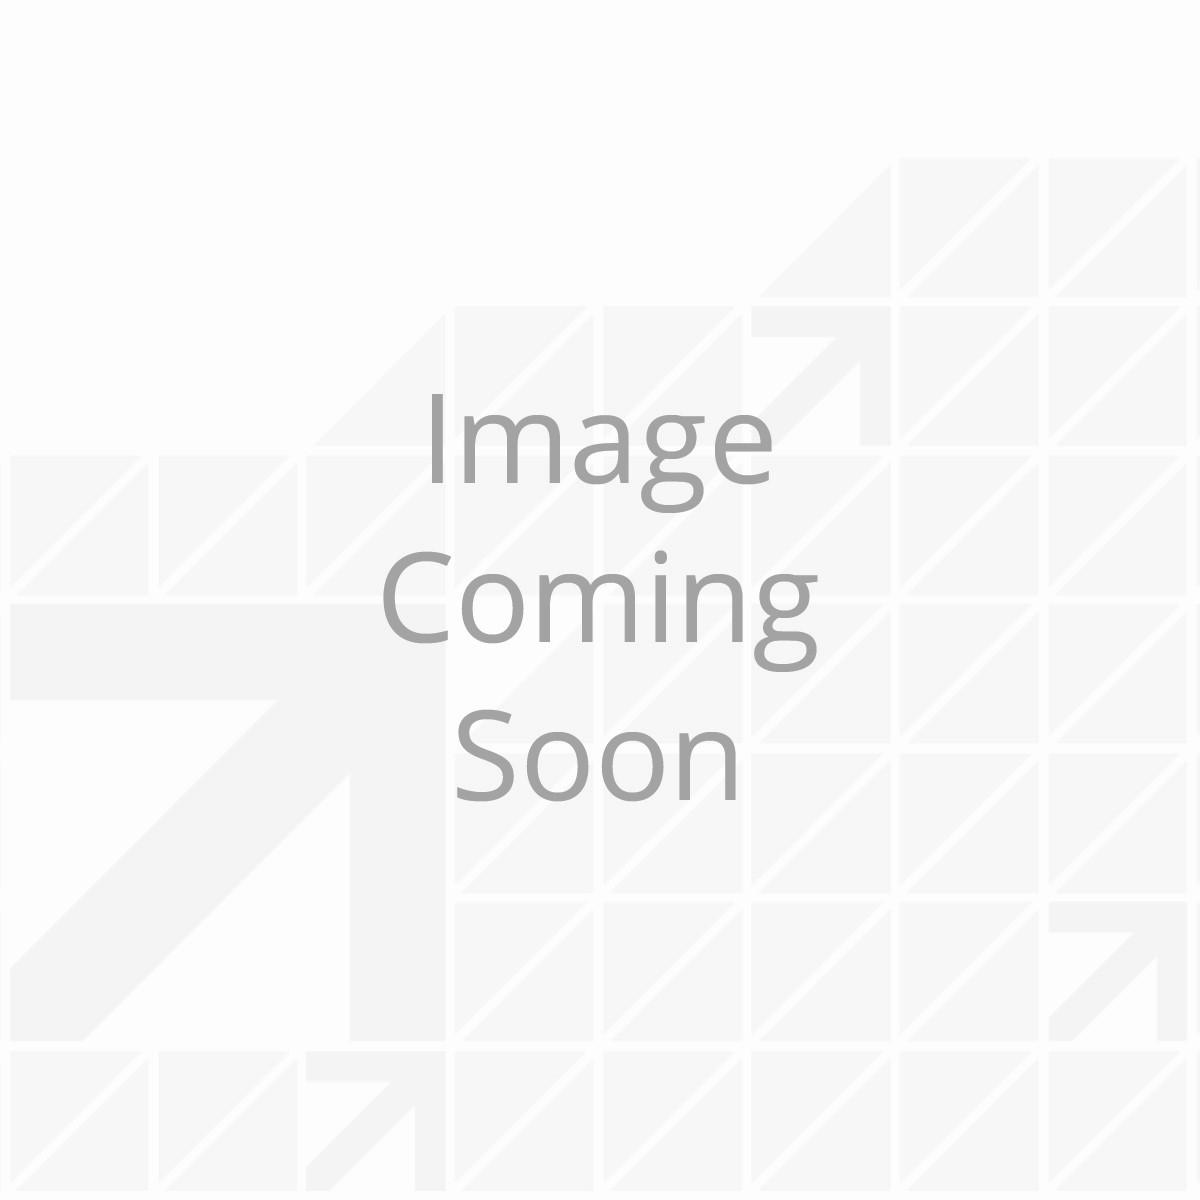 15.5 BTU Rooftop Air Conditioner, White